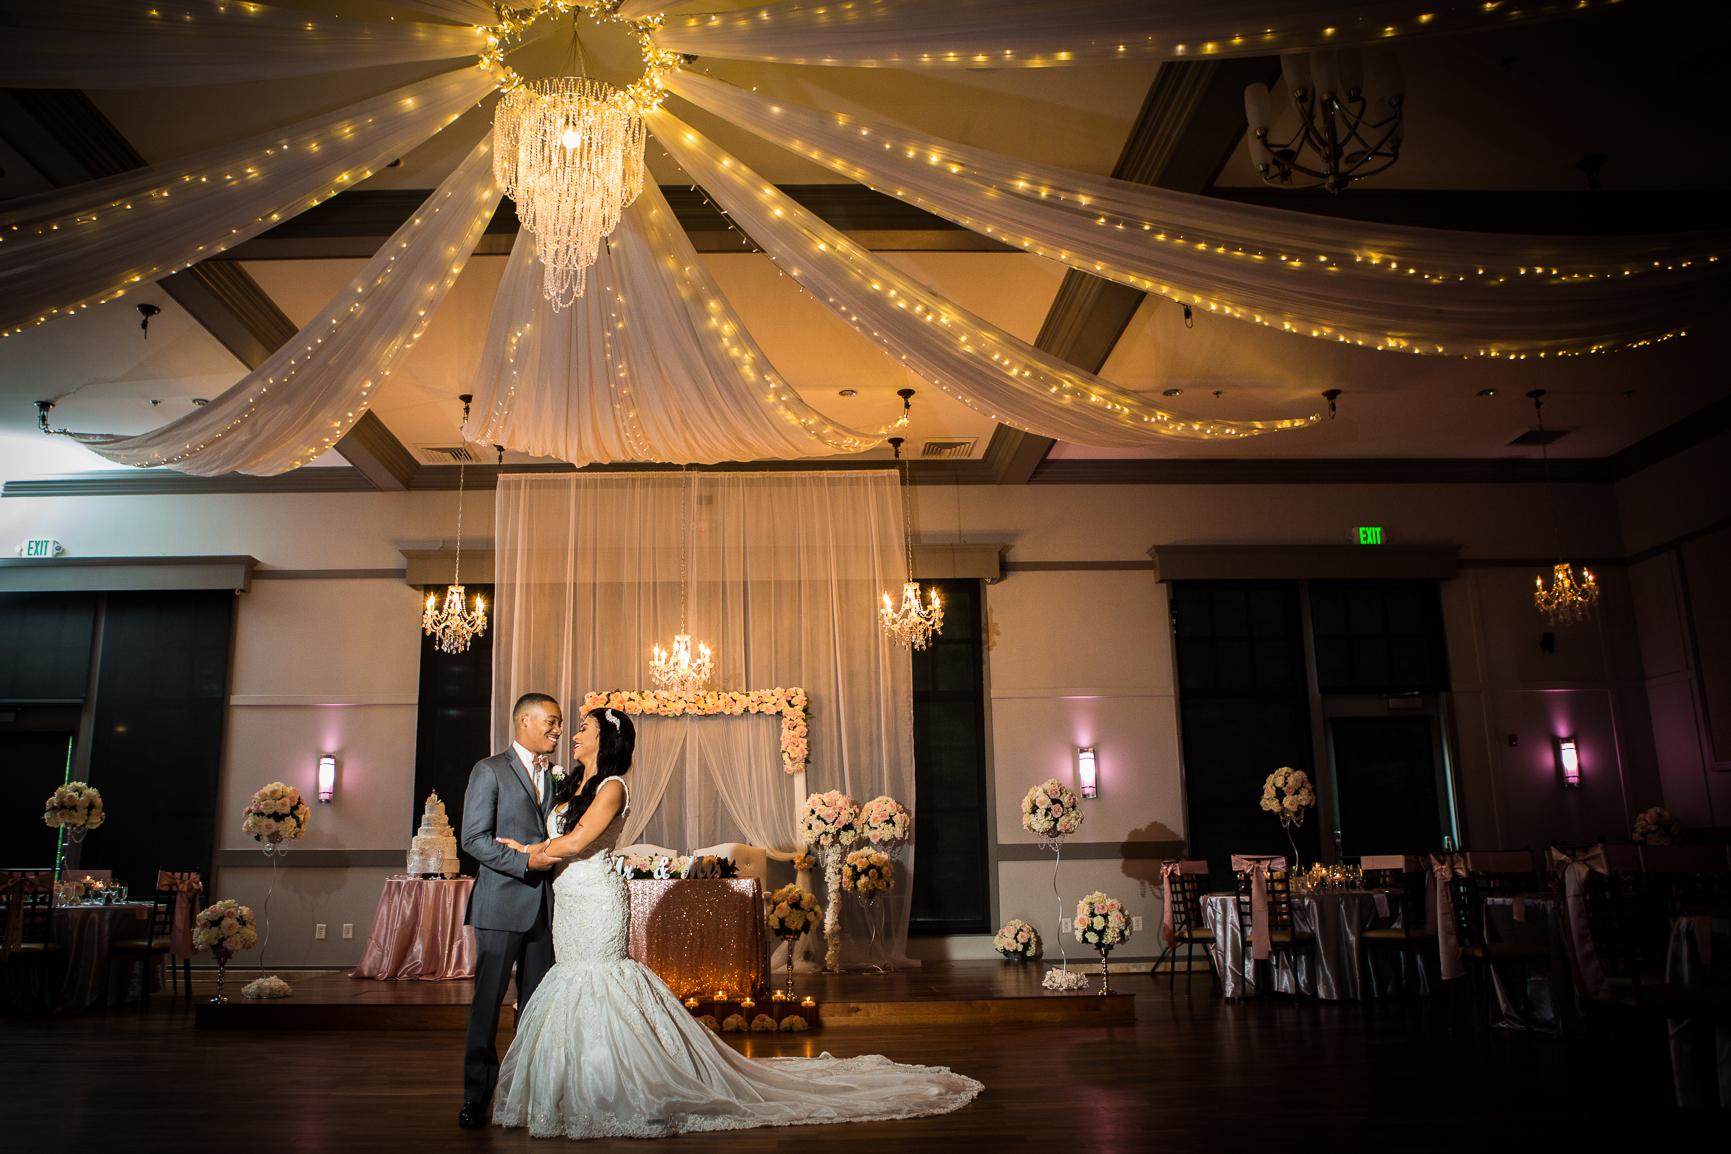 Noah's Morrisville wedding venue photographer - 101 studio llc -19.jpg